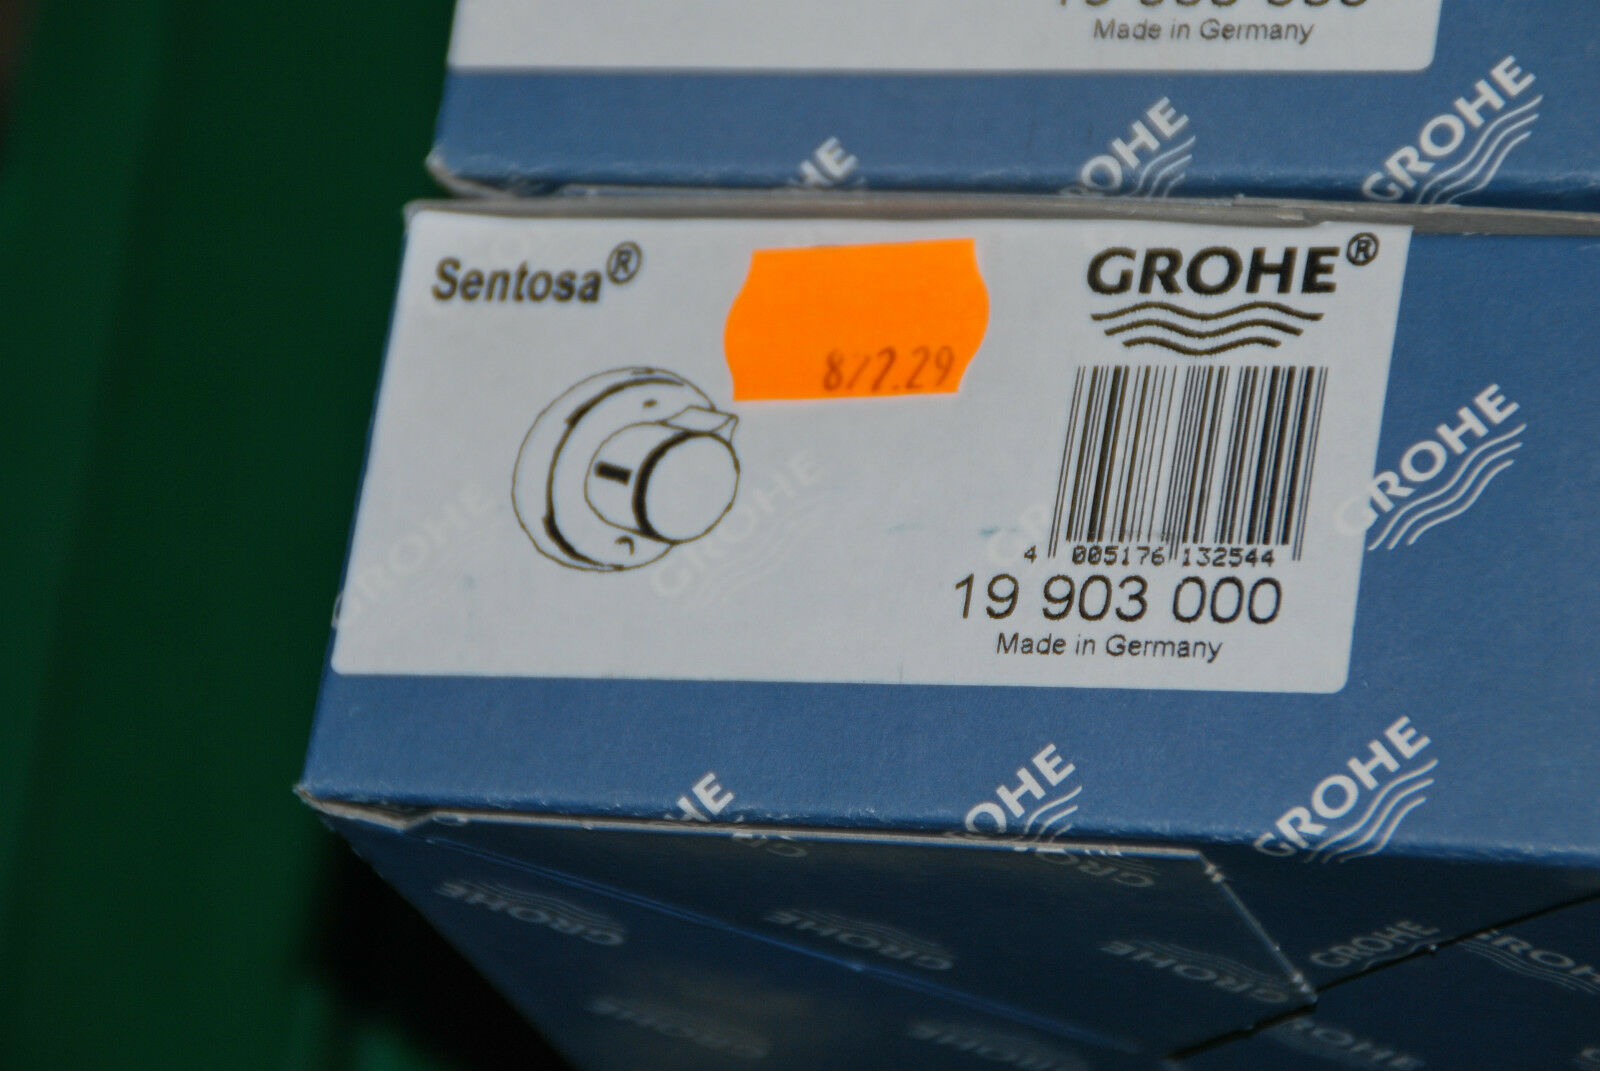 GROHE 19903 19903000 SENTOSA 3 WEGE UMSTELLUNG UMSCHALTER CHROM NEU